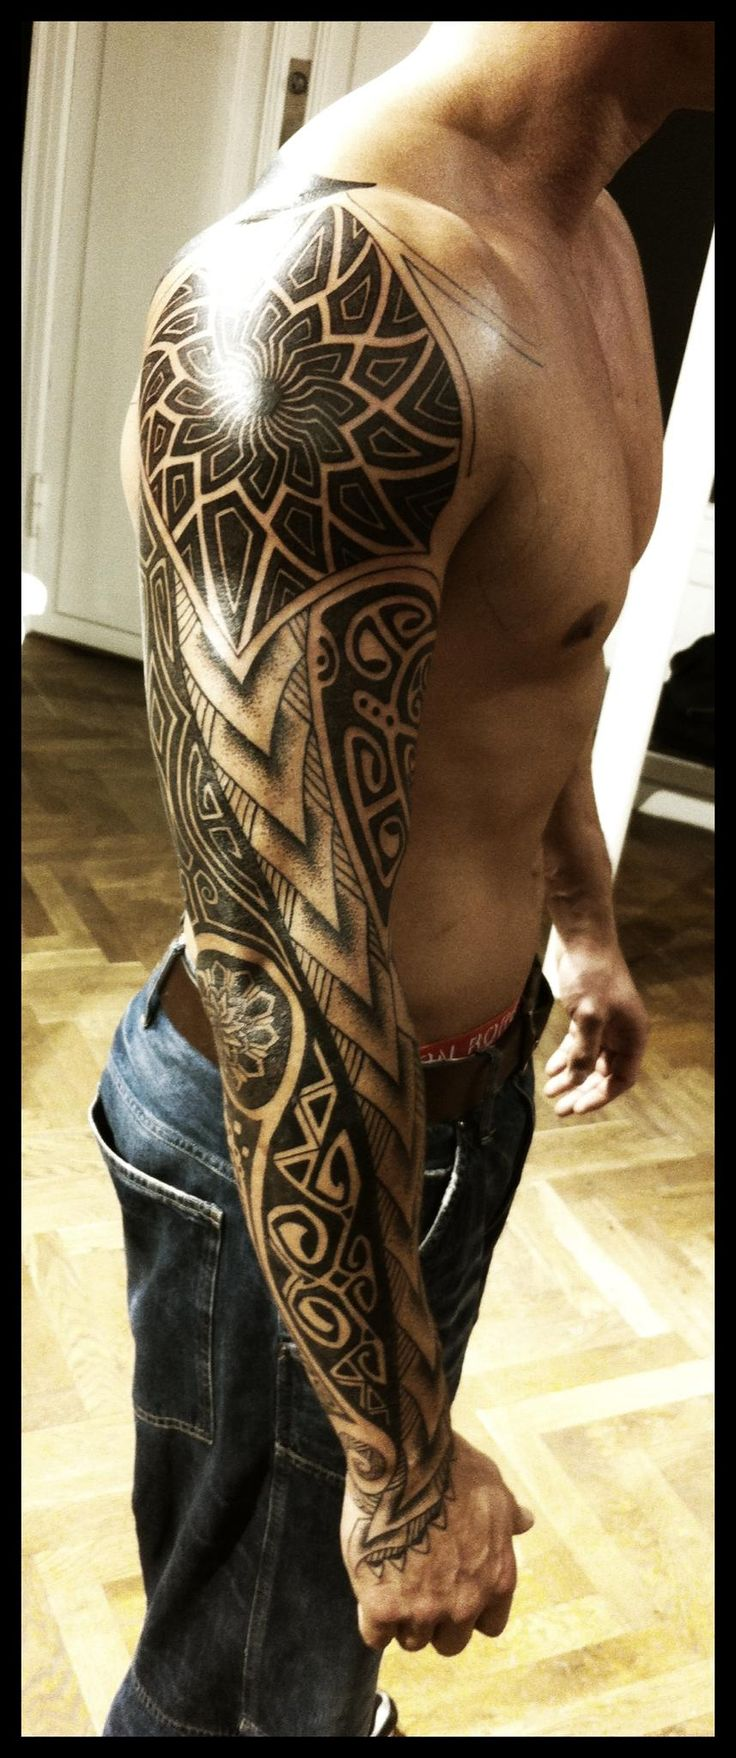 Tahiti tribal polynesian tattoo sleeve with a bold flower